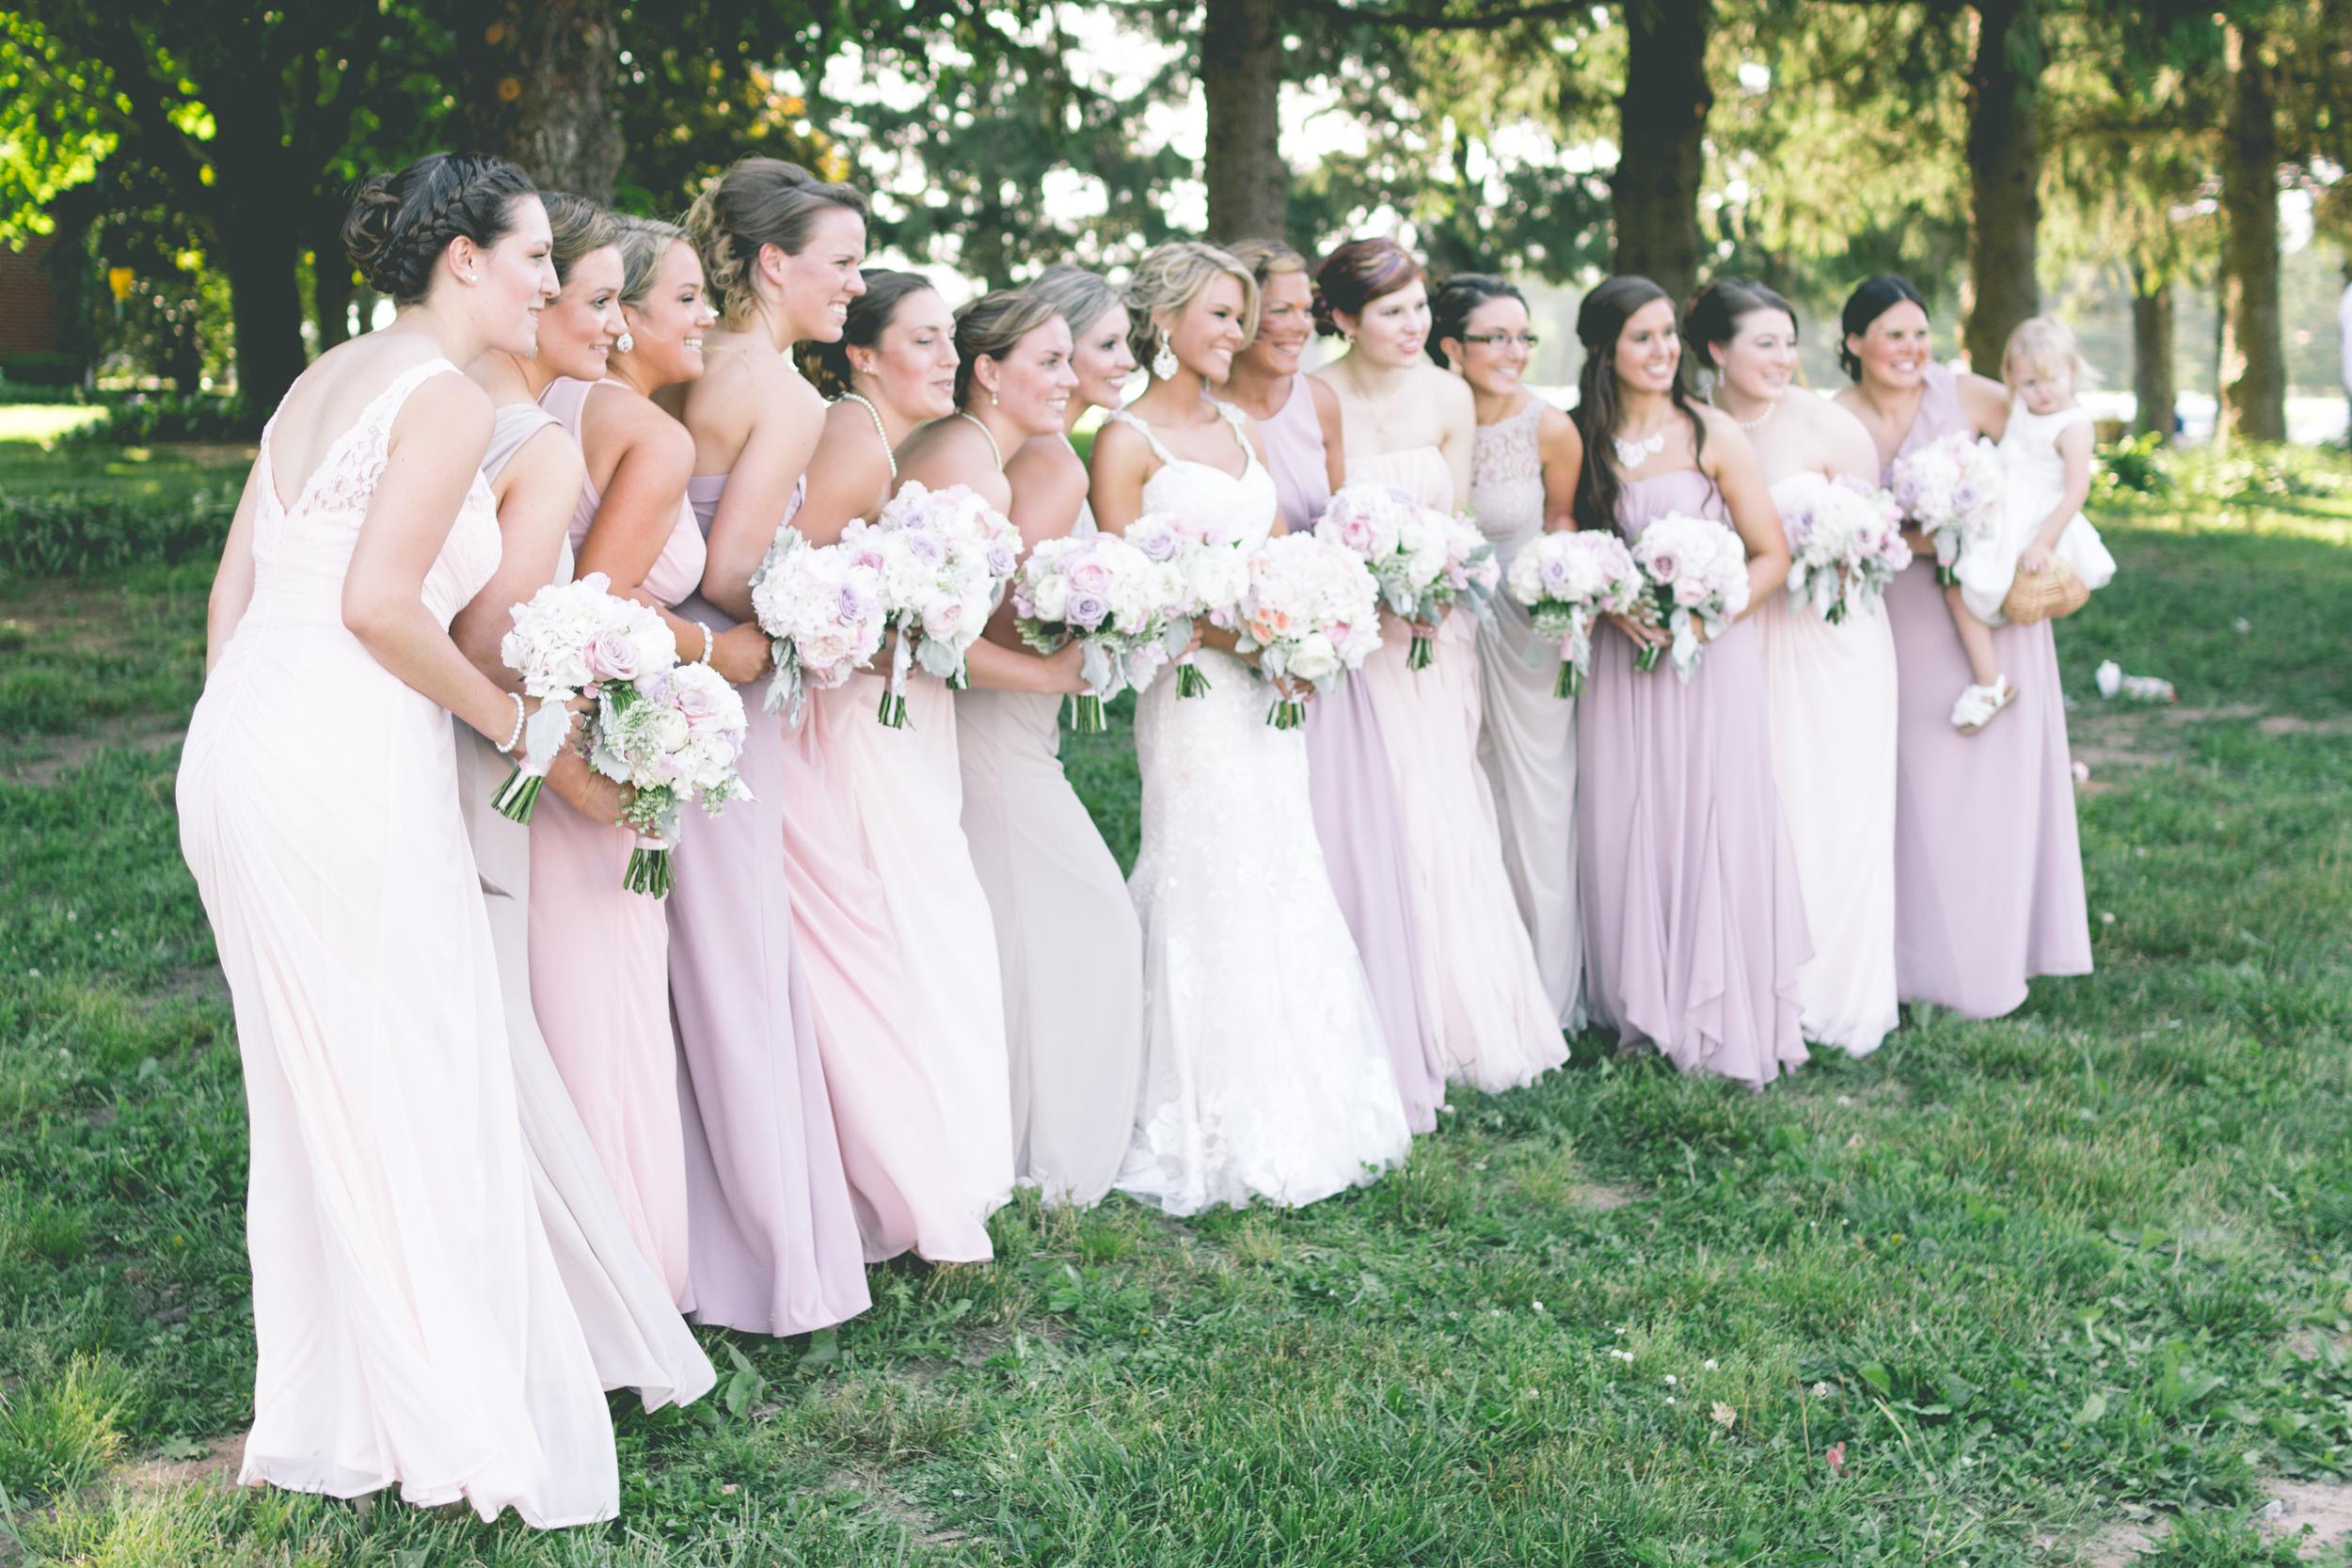 Ashley_Joe_Rustic_Wedding-23.jpg